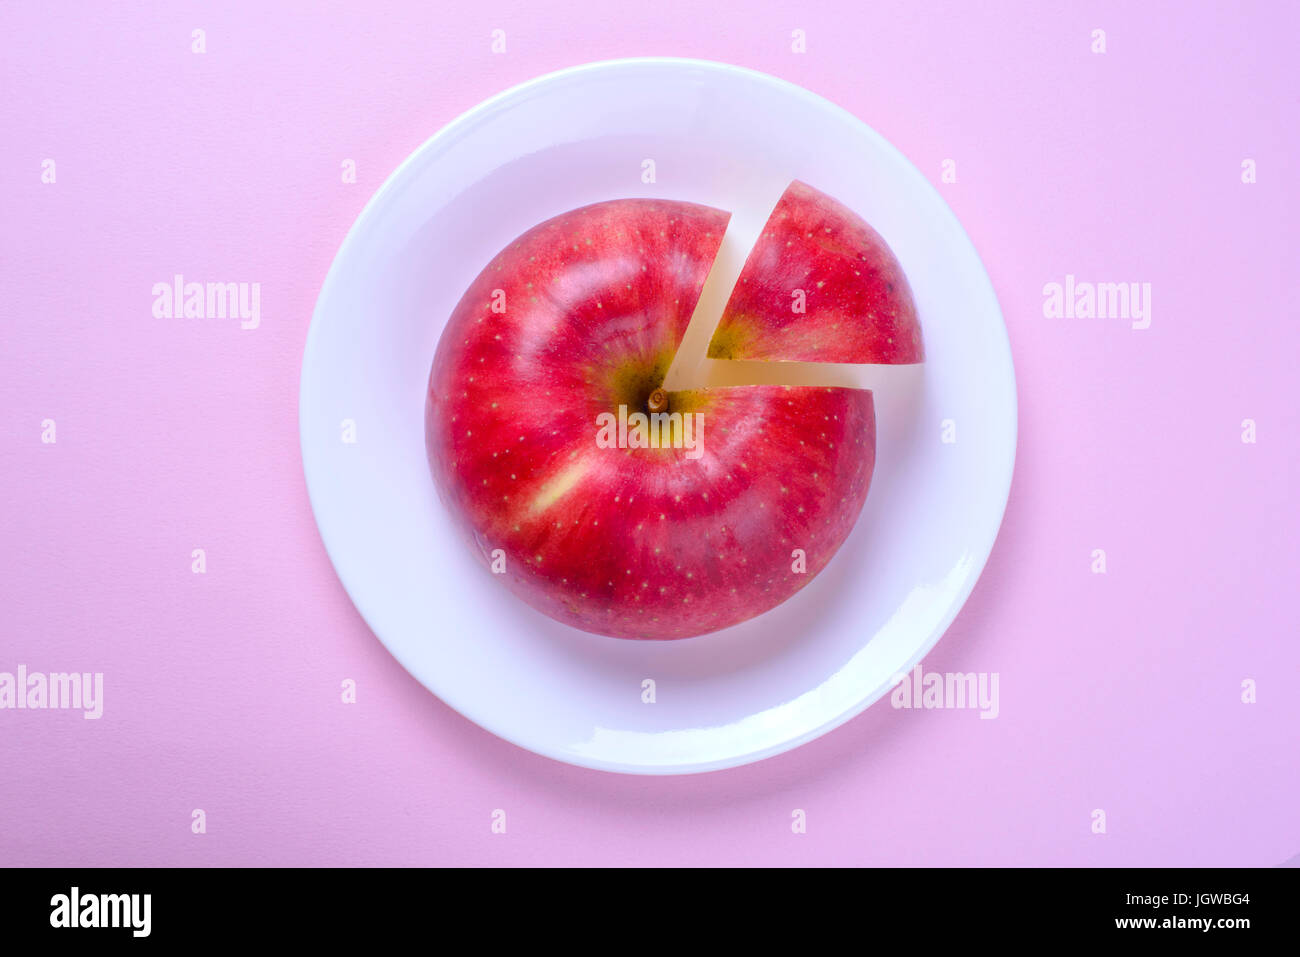 Apple pie chart stock photo royalty free image 148075316 alamy apple pie chart nvjuhfo Images